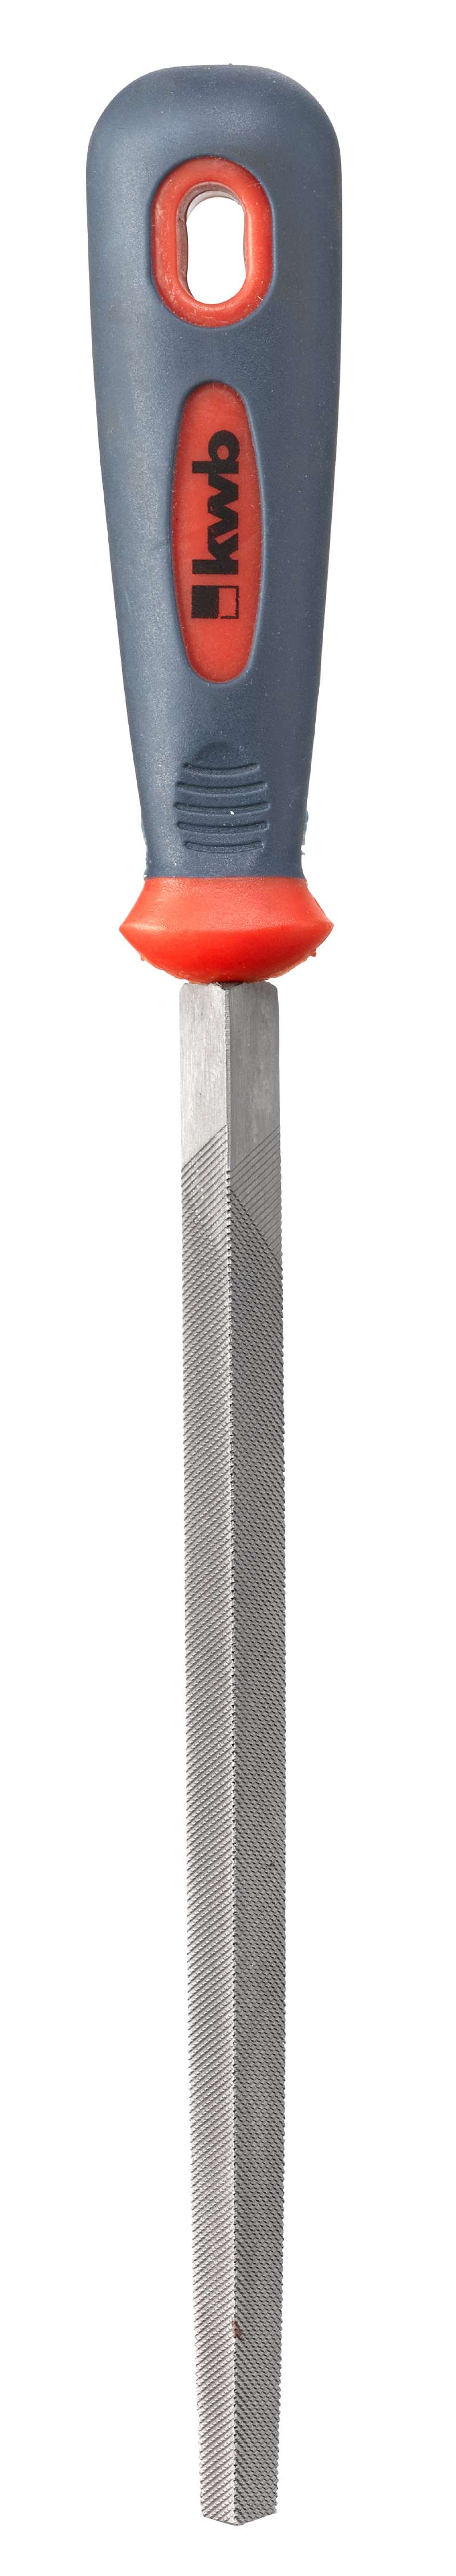 Напильник по металлу Kwb 4803-50